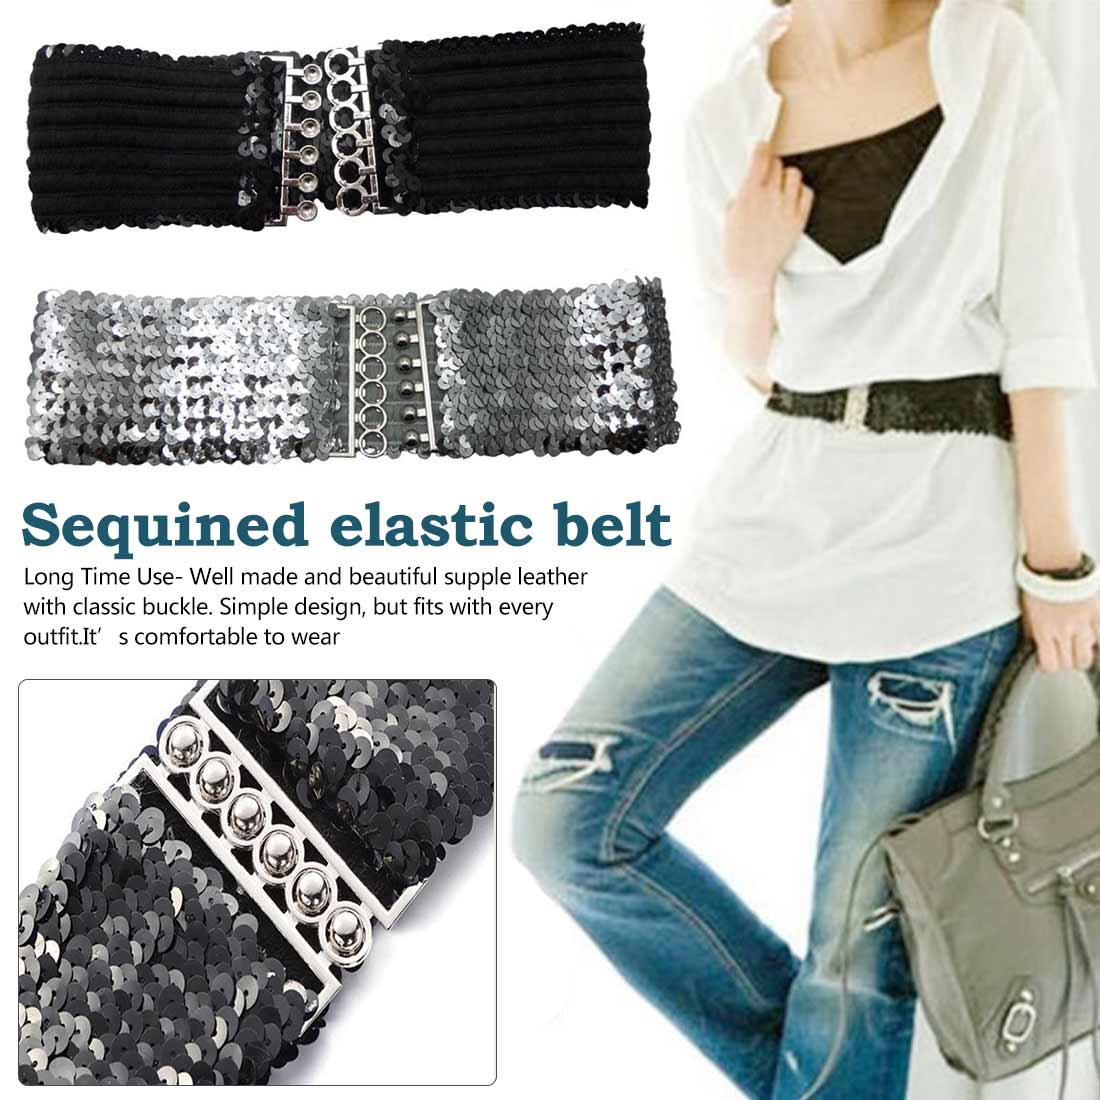 Vintage Manual Sequins Women Waist Belt  Buckle Waistband Black Elastic Casual Stretch Belt